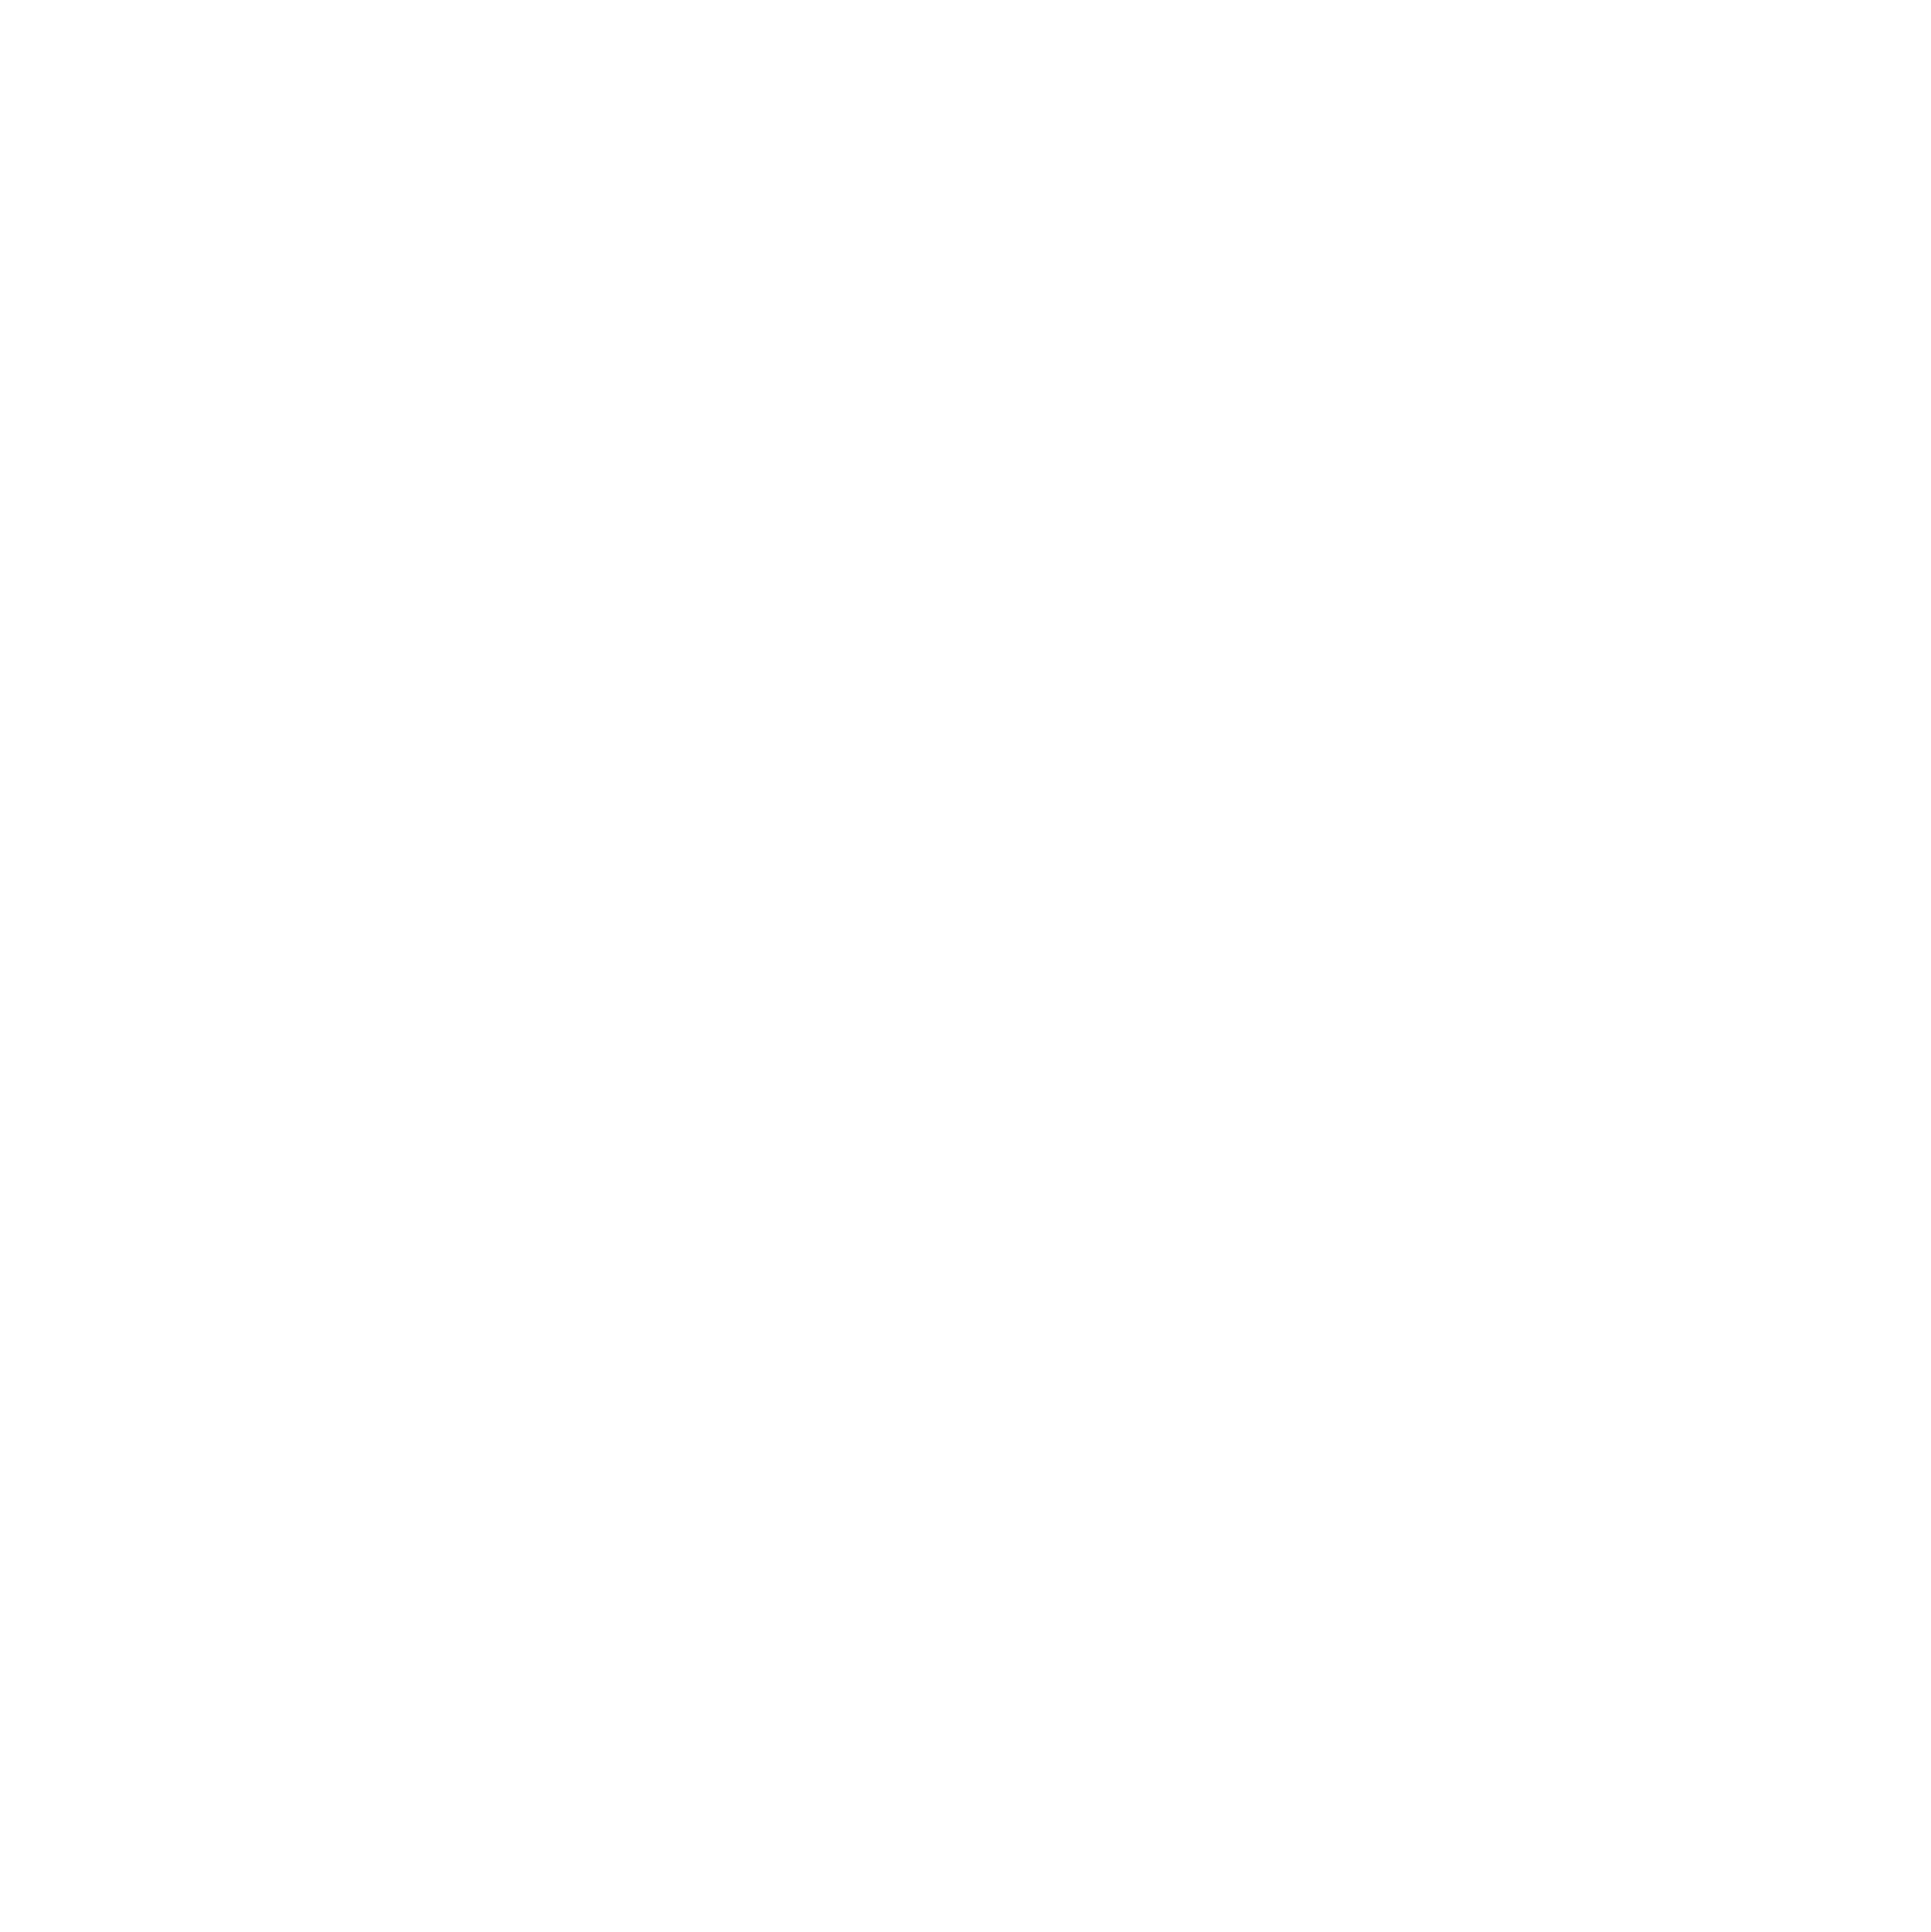 DJK Wittichenau